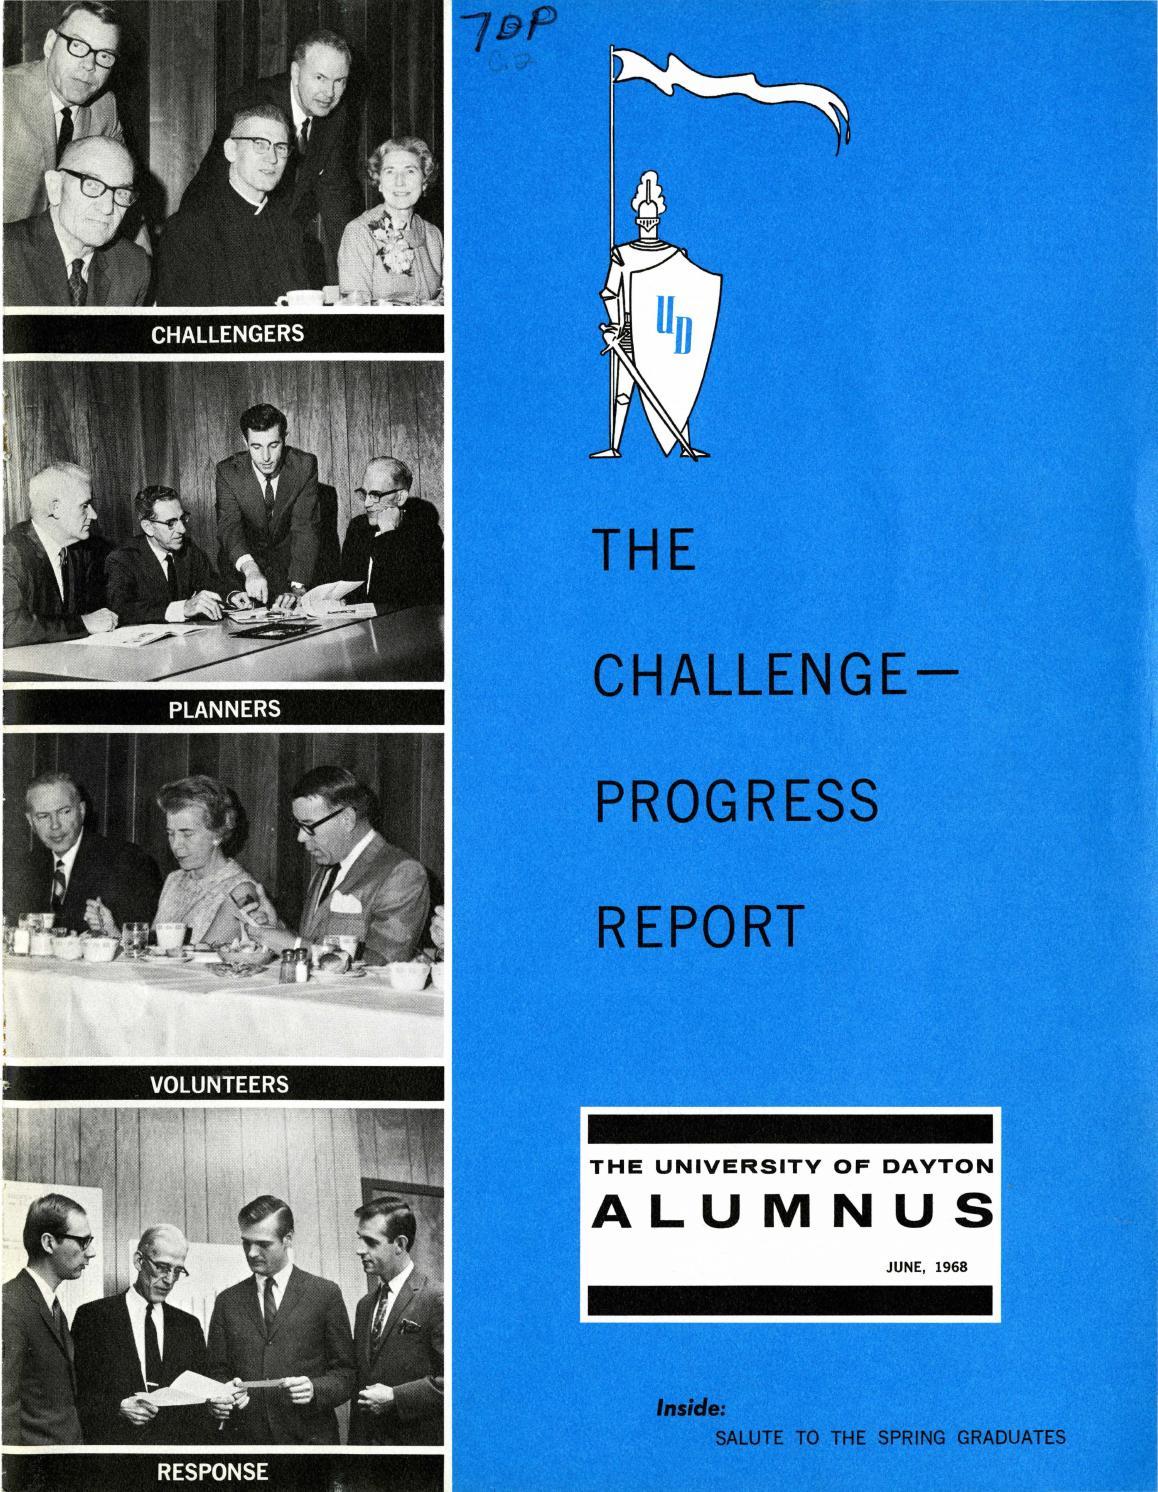 The University Of Dayton Alumnus June 1968 By Ecommons Issuu